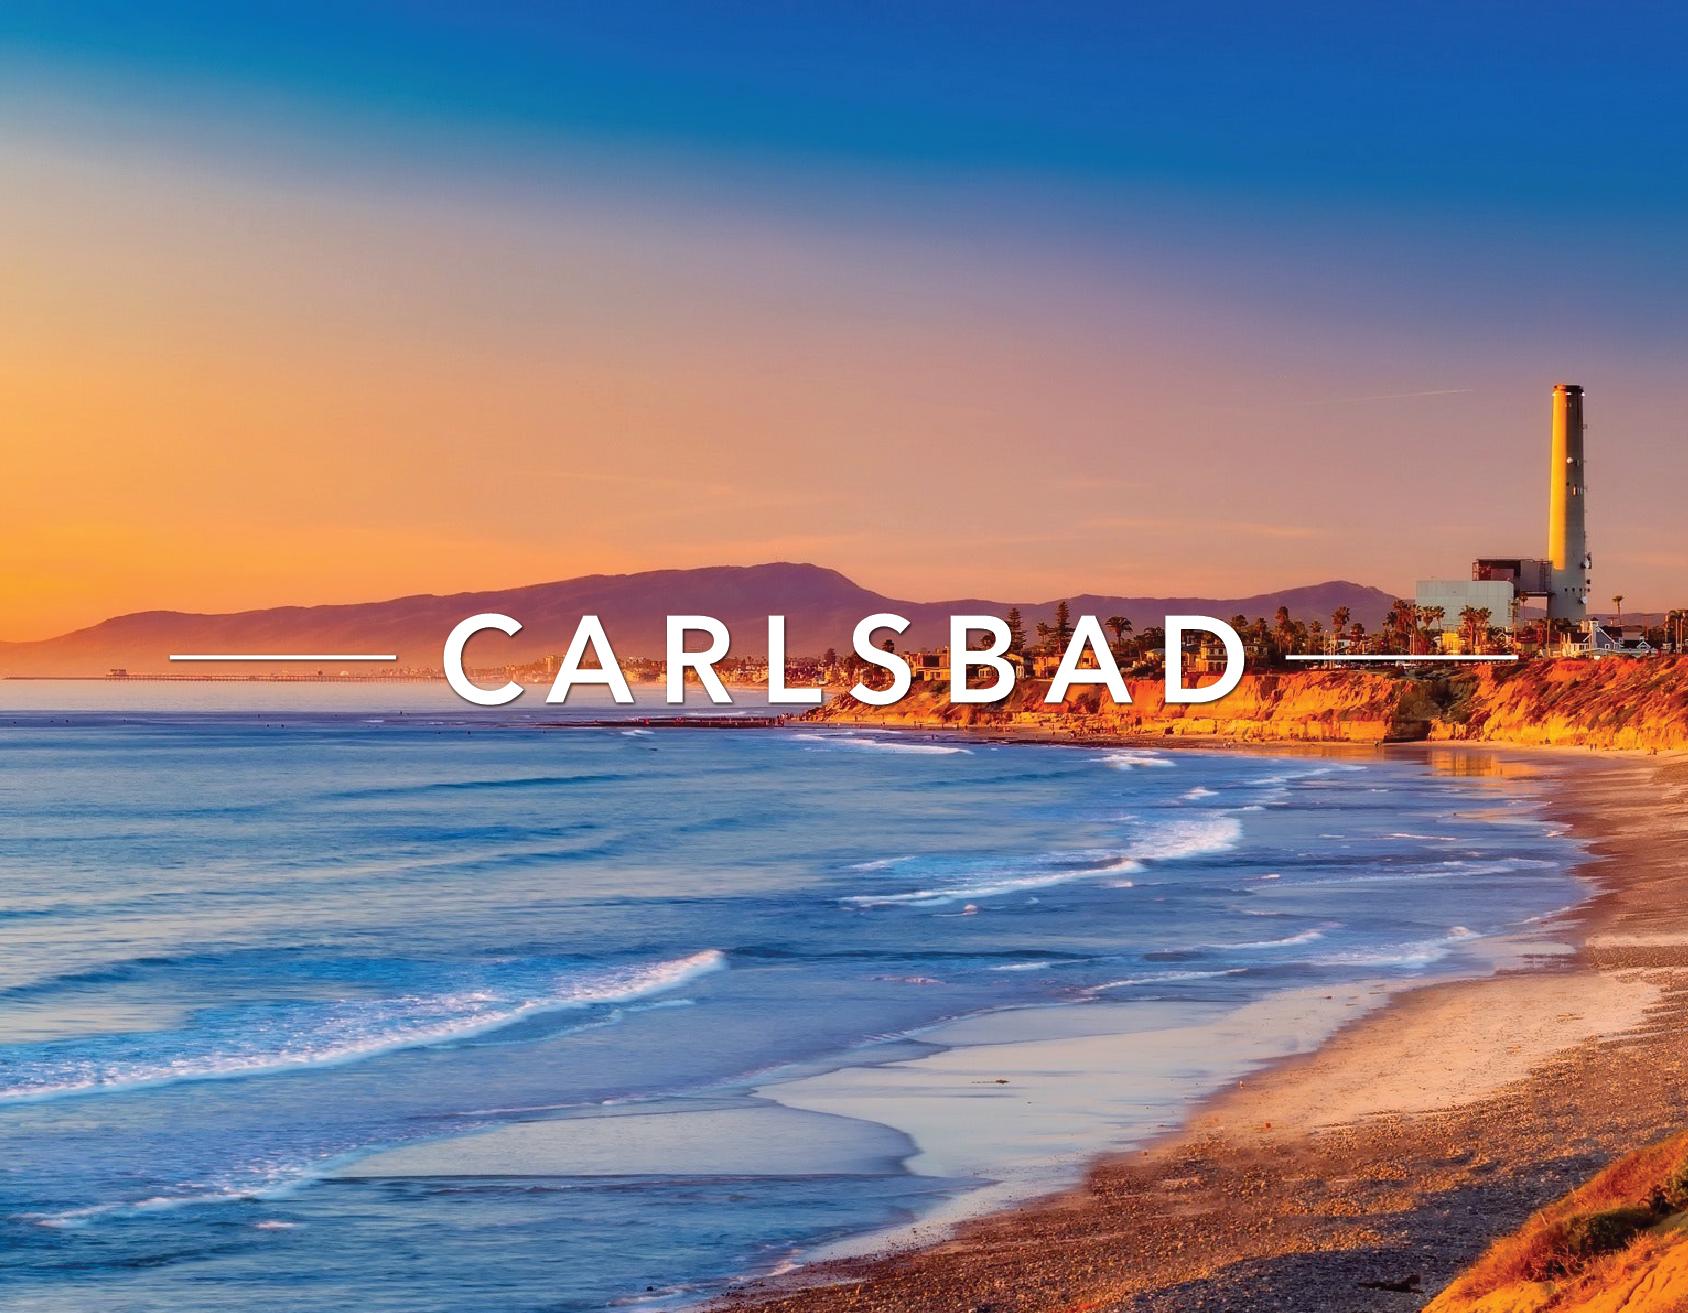 carlsbad-01